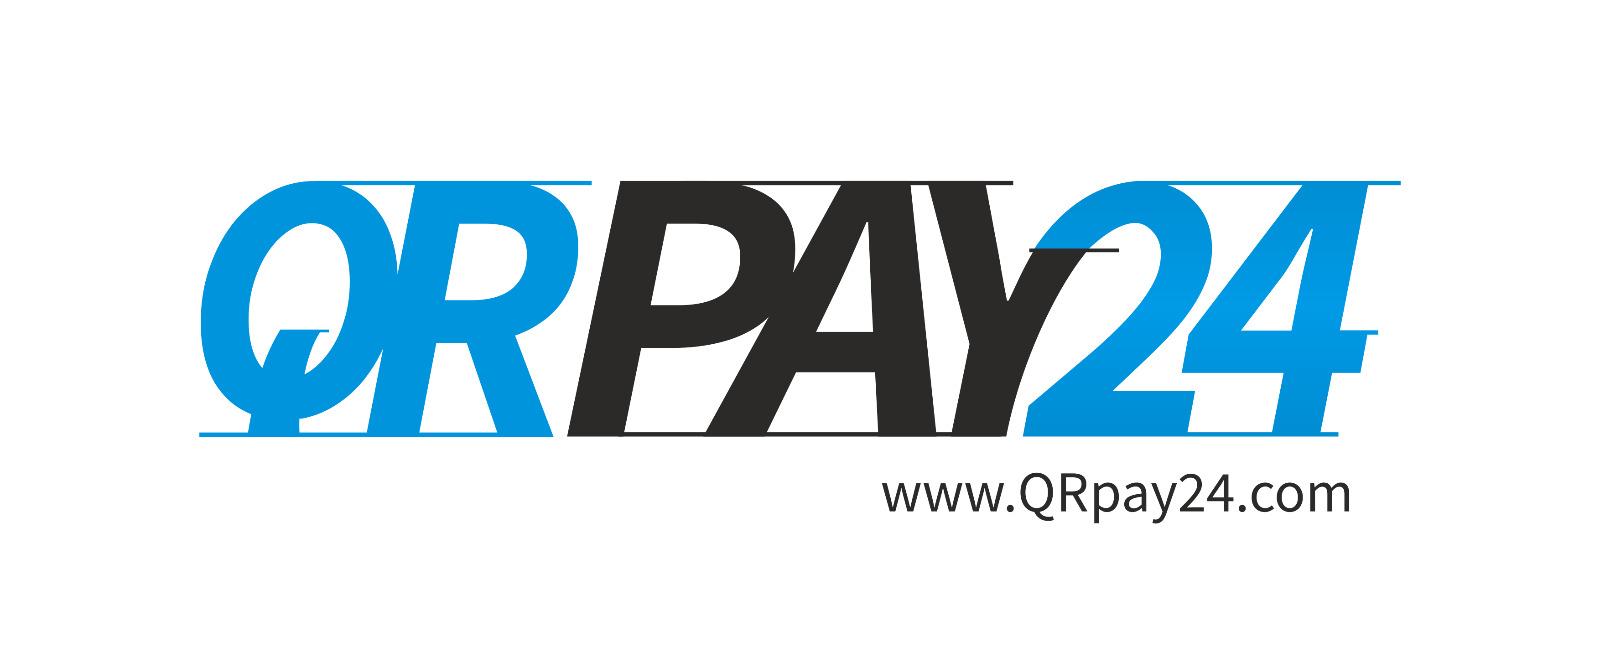 QRPay24 neue coronafreie Bezahlmethode aus Isen